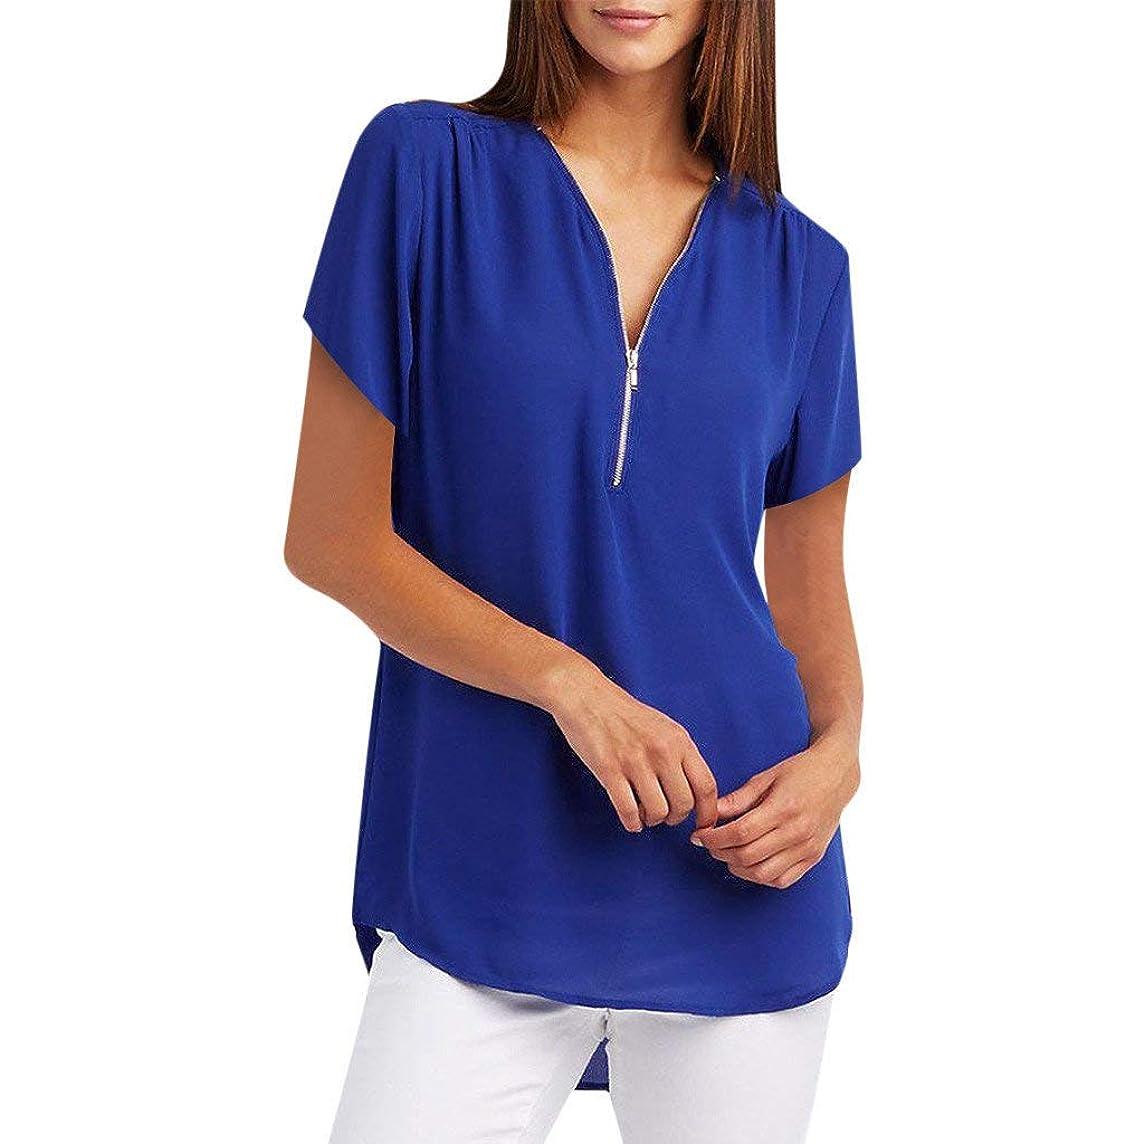 CCOOfhhc Women Loose Sleeveless Cross Back Hem Layed Zipper V-Neck T Shirts Tops Back Cross Strap Basic Camisole Tank Top